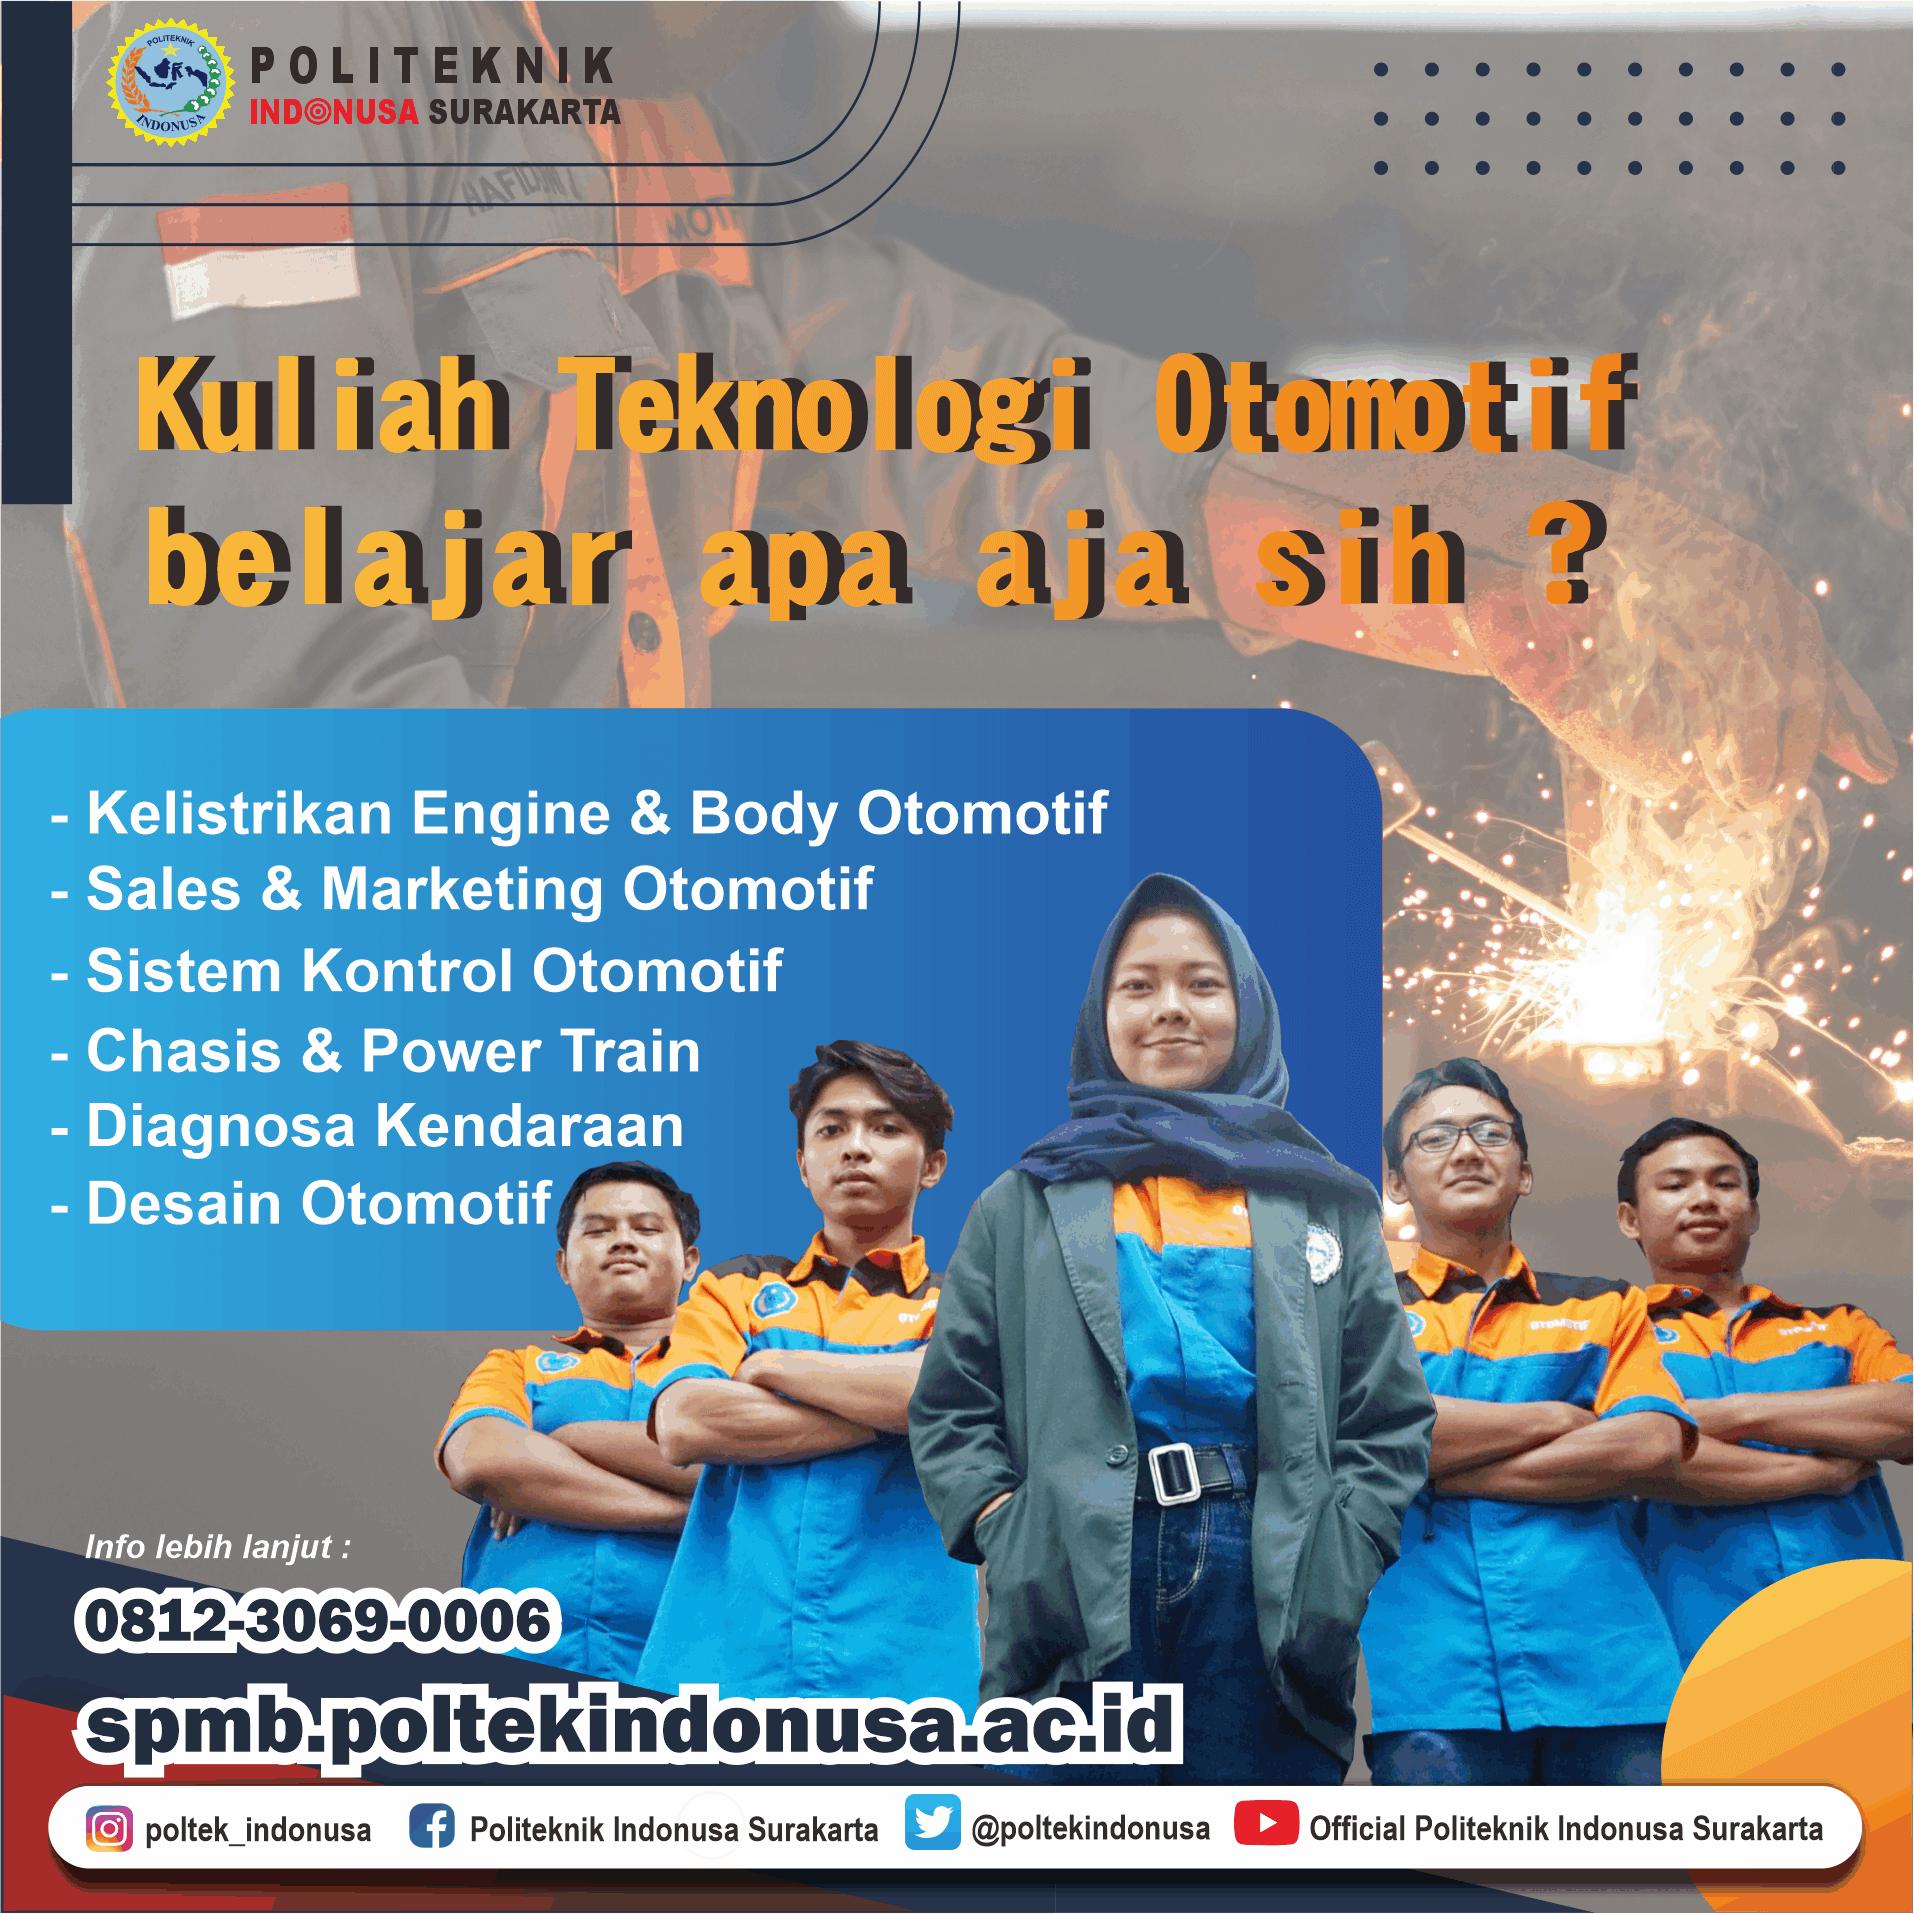 Program Studi D3 Teknologi Otomotif Politeknik Indonusa Surakarta